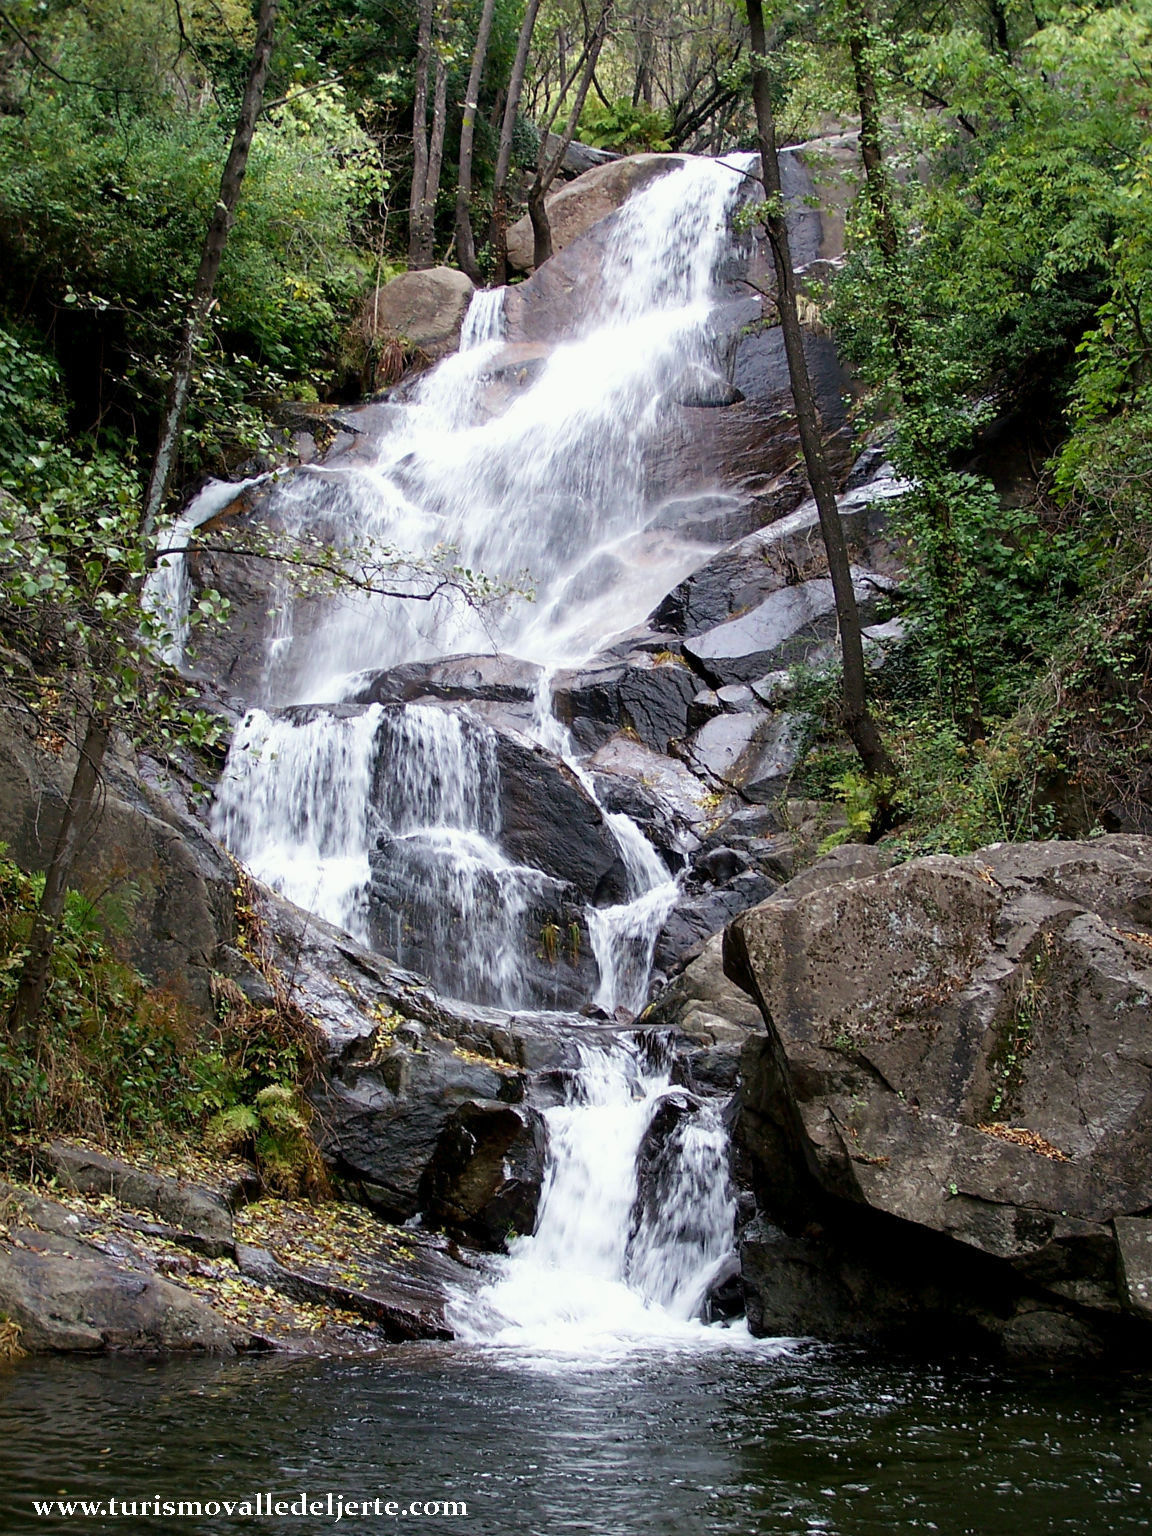 Cascadas de las nogaleas valle del jerte for Oficina de turismo valle del jerte